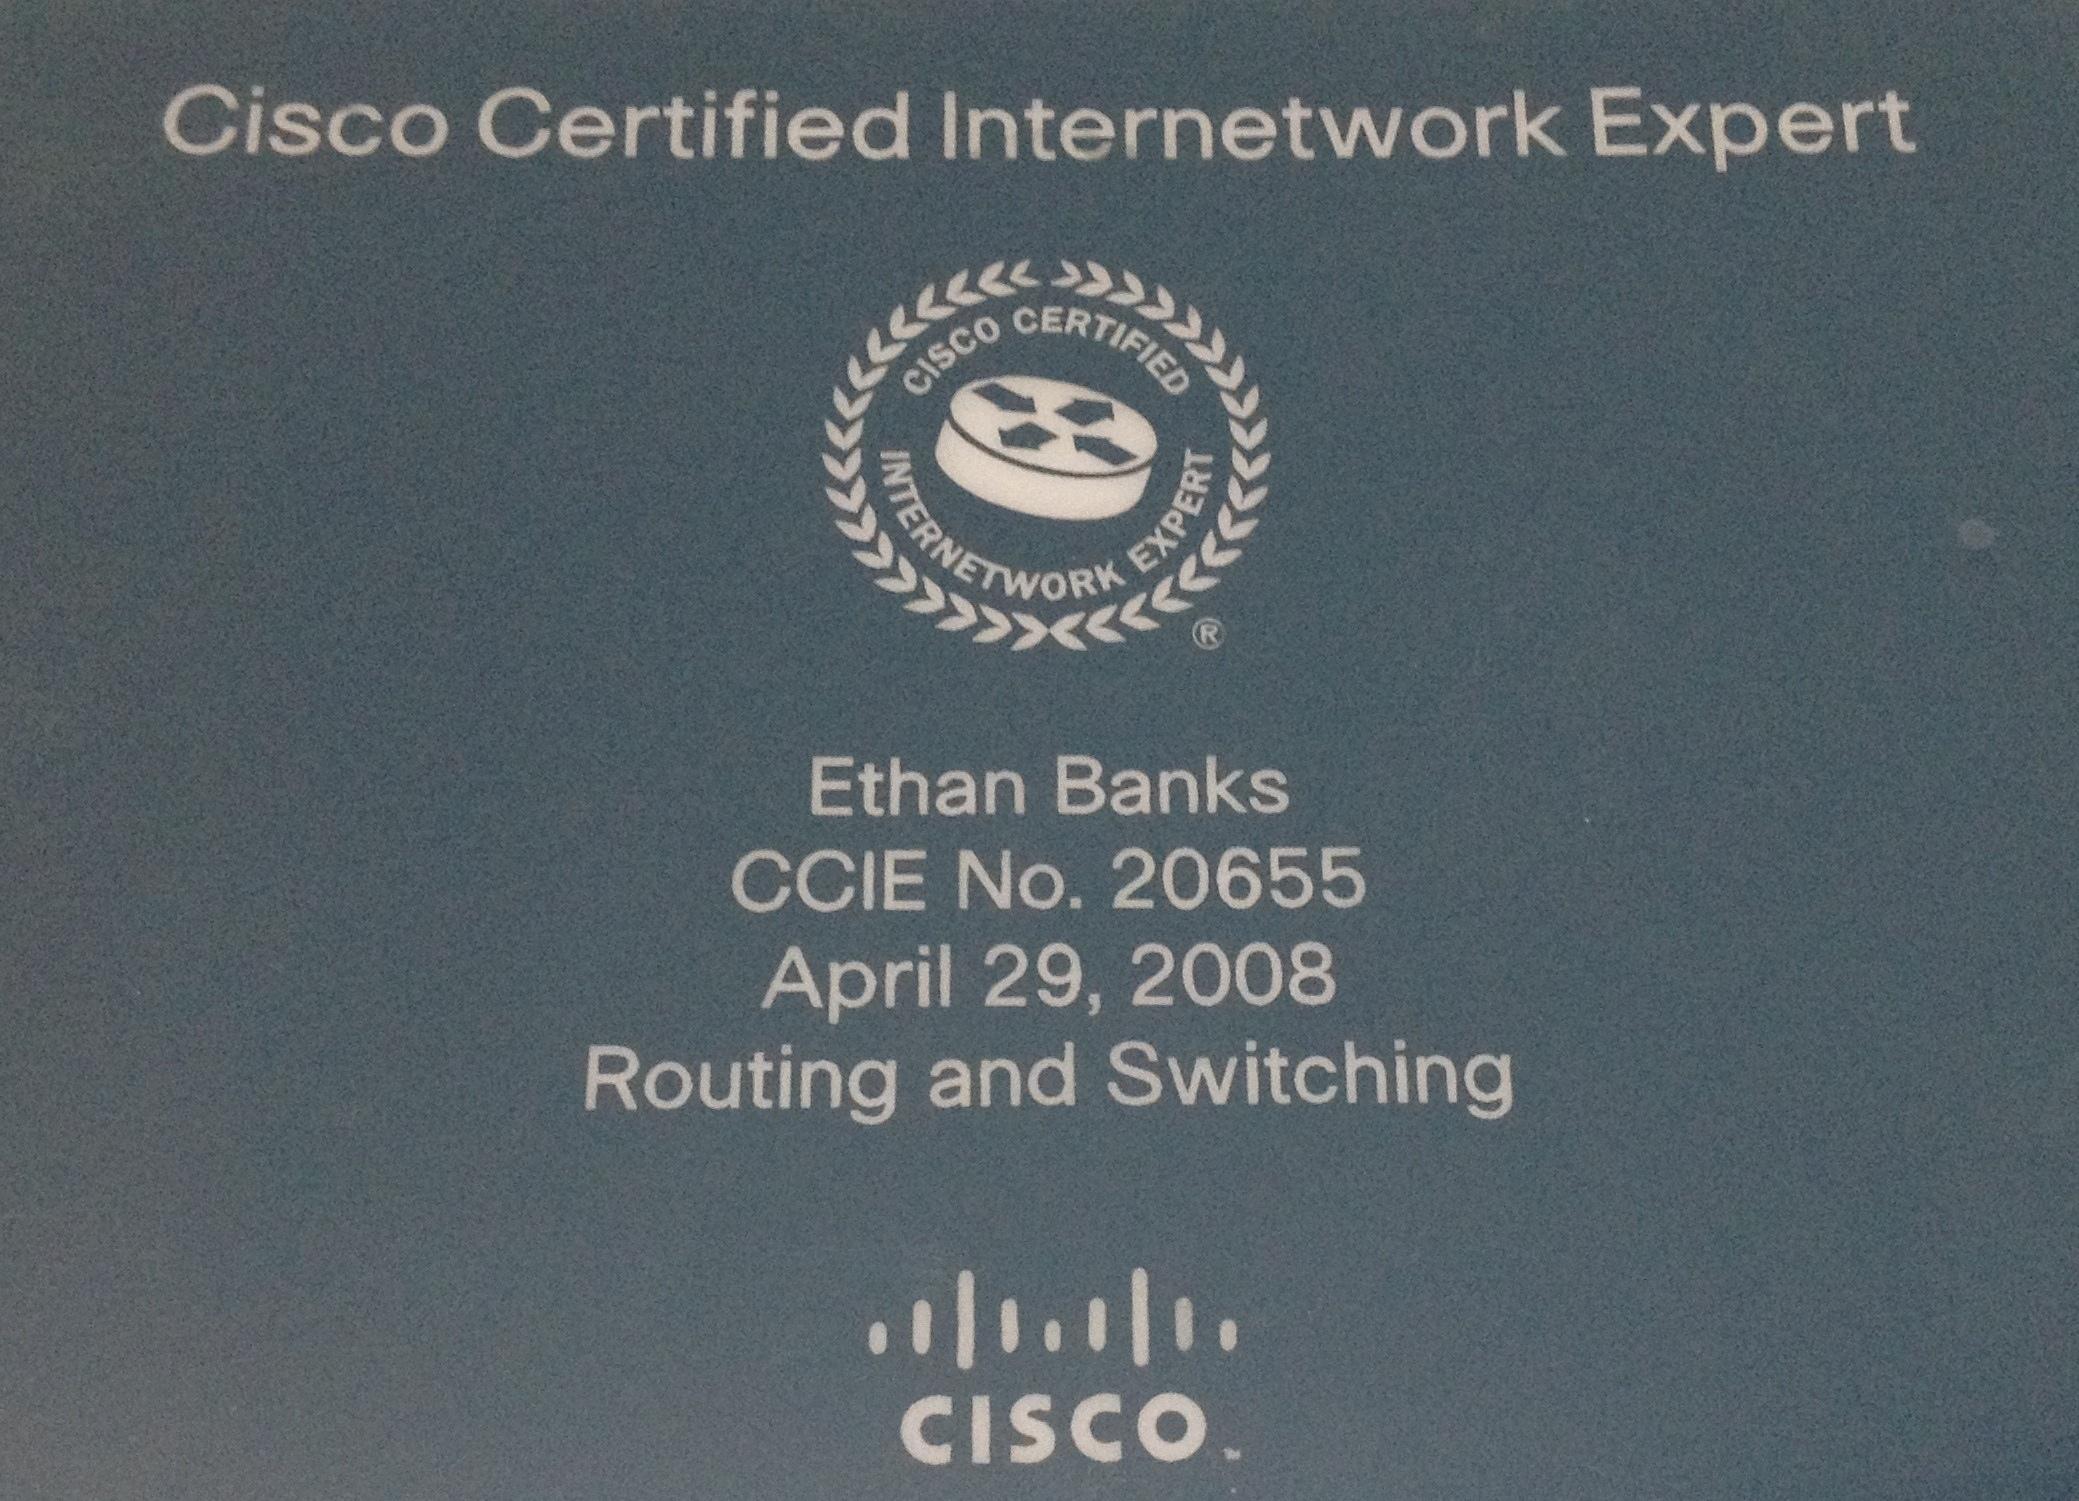 ccie certification recertification plaque